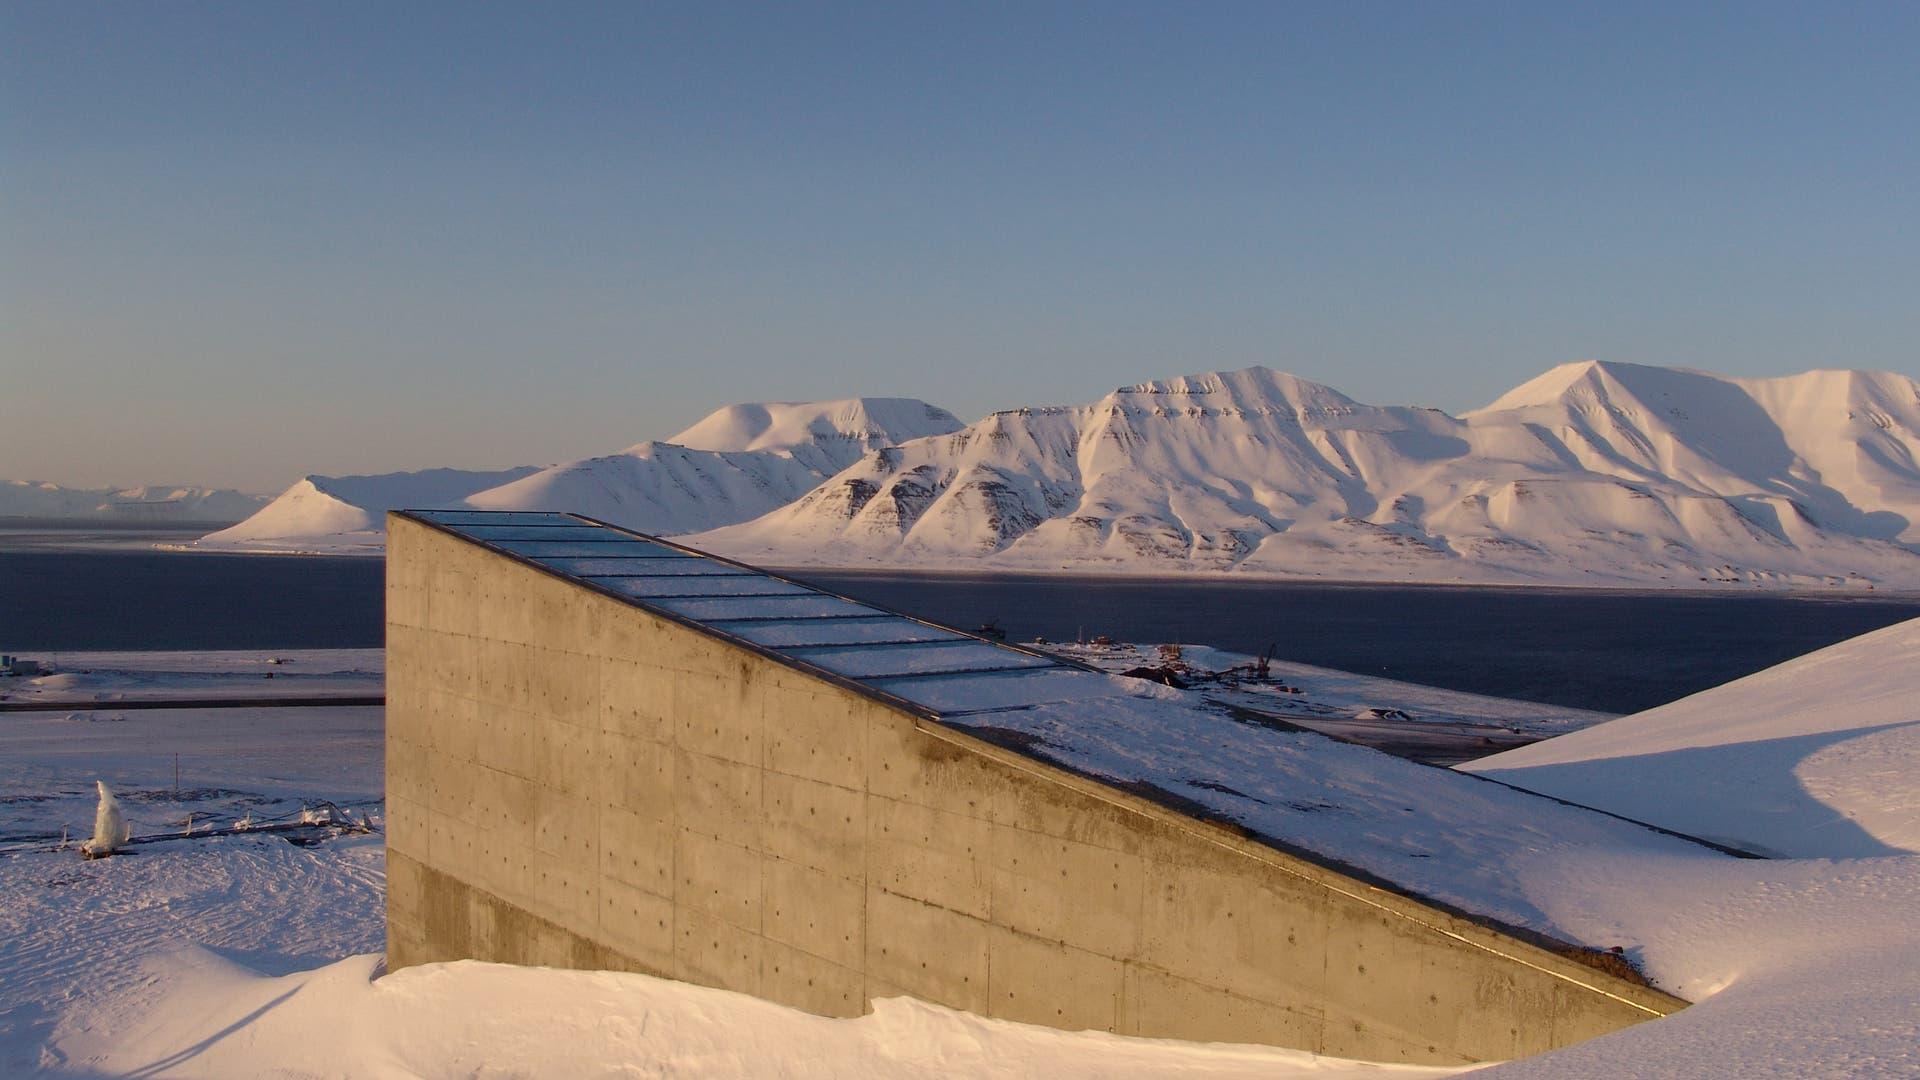 Svalbard Global Seed Vault - Schatzkammer der Menschheit